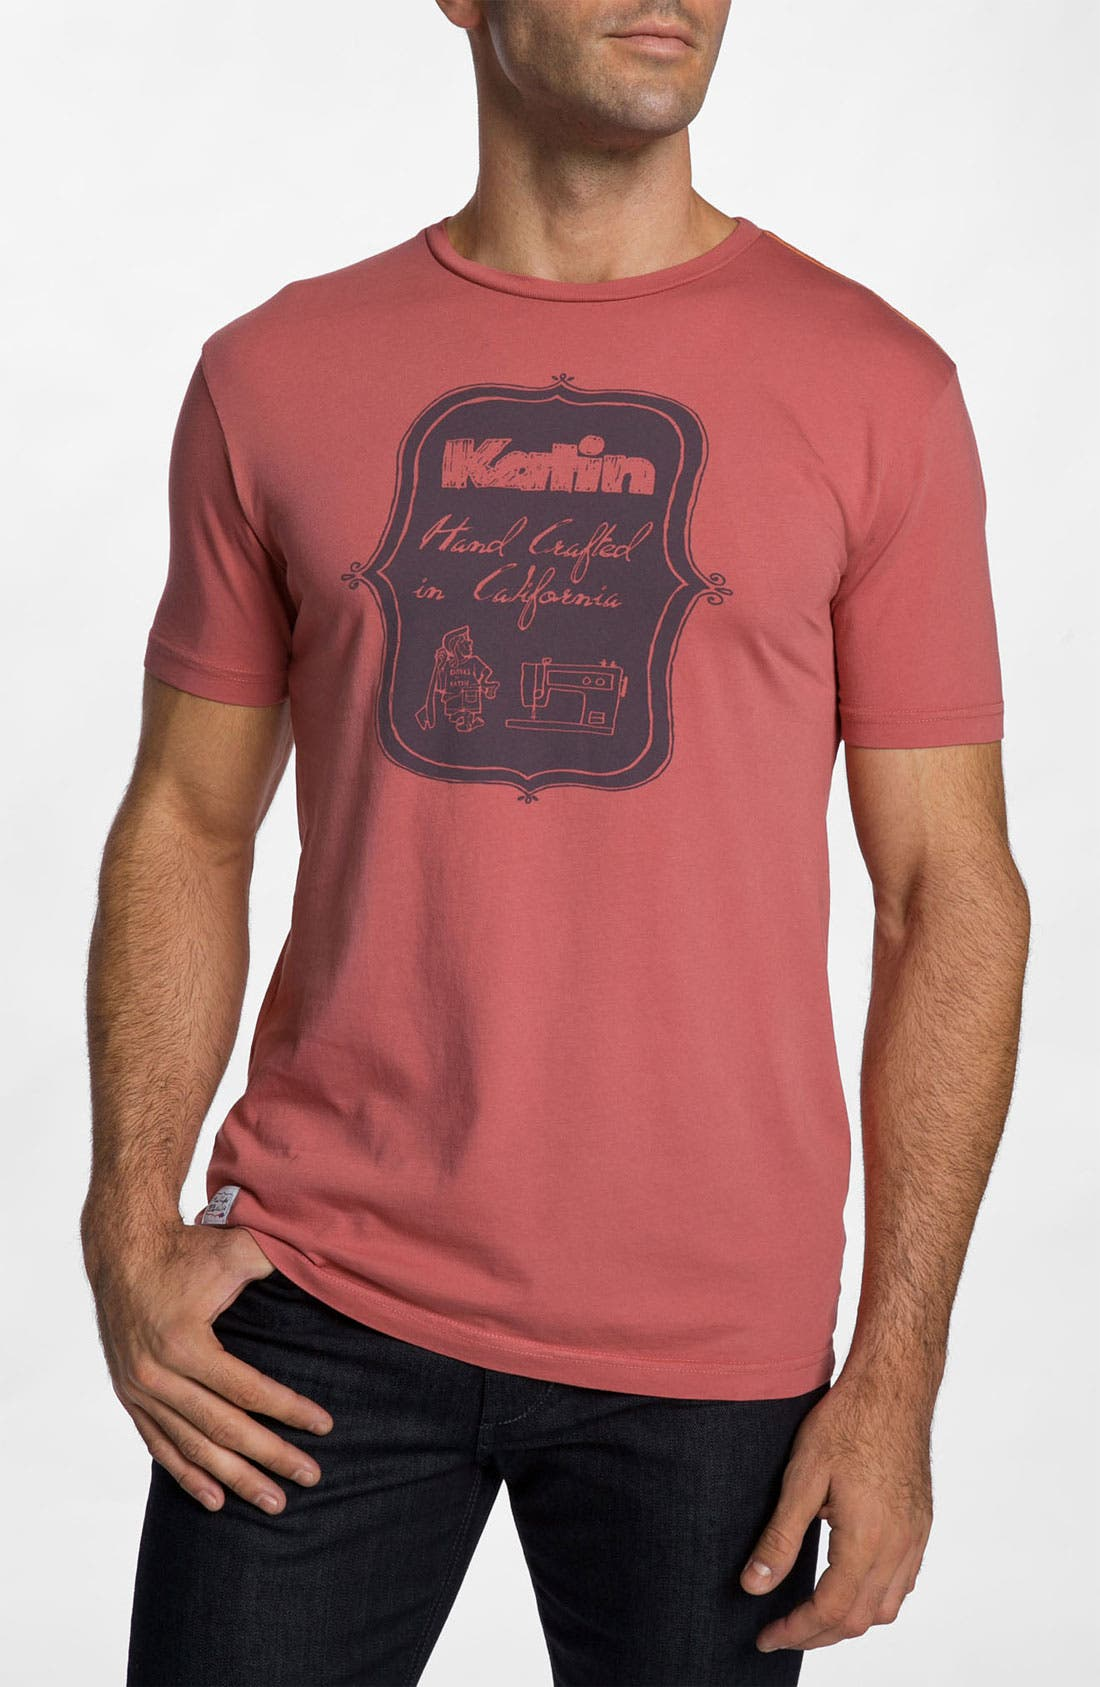 Main Image - Katin 'Hand Crafted' Graphic T-Shirt